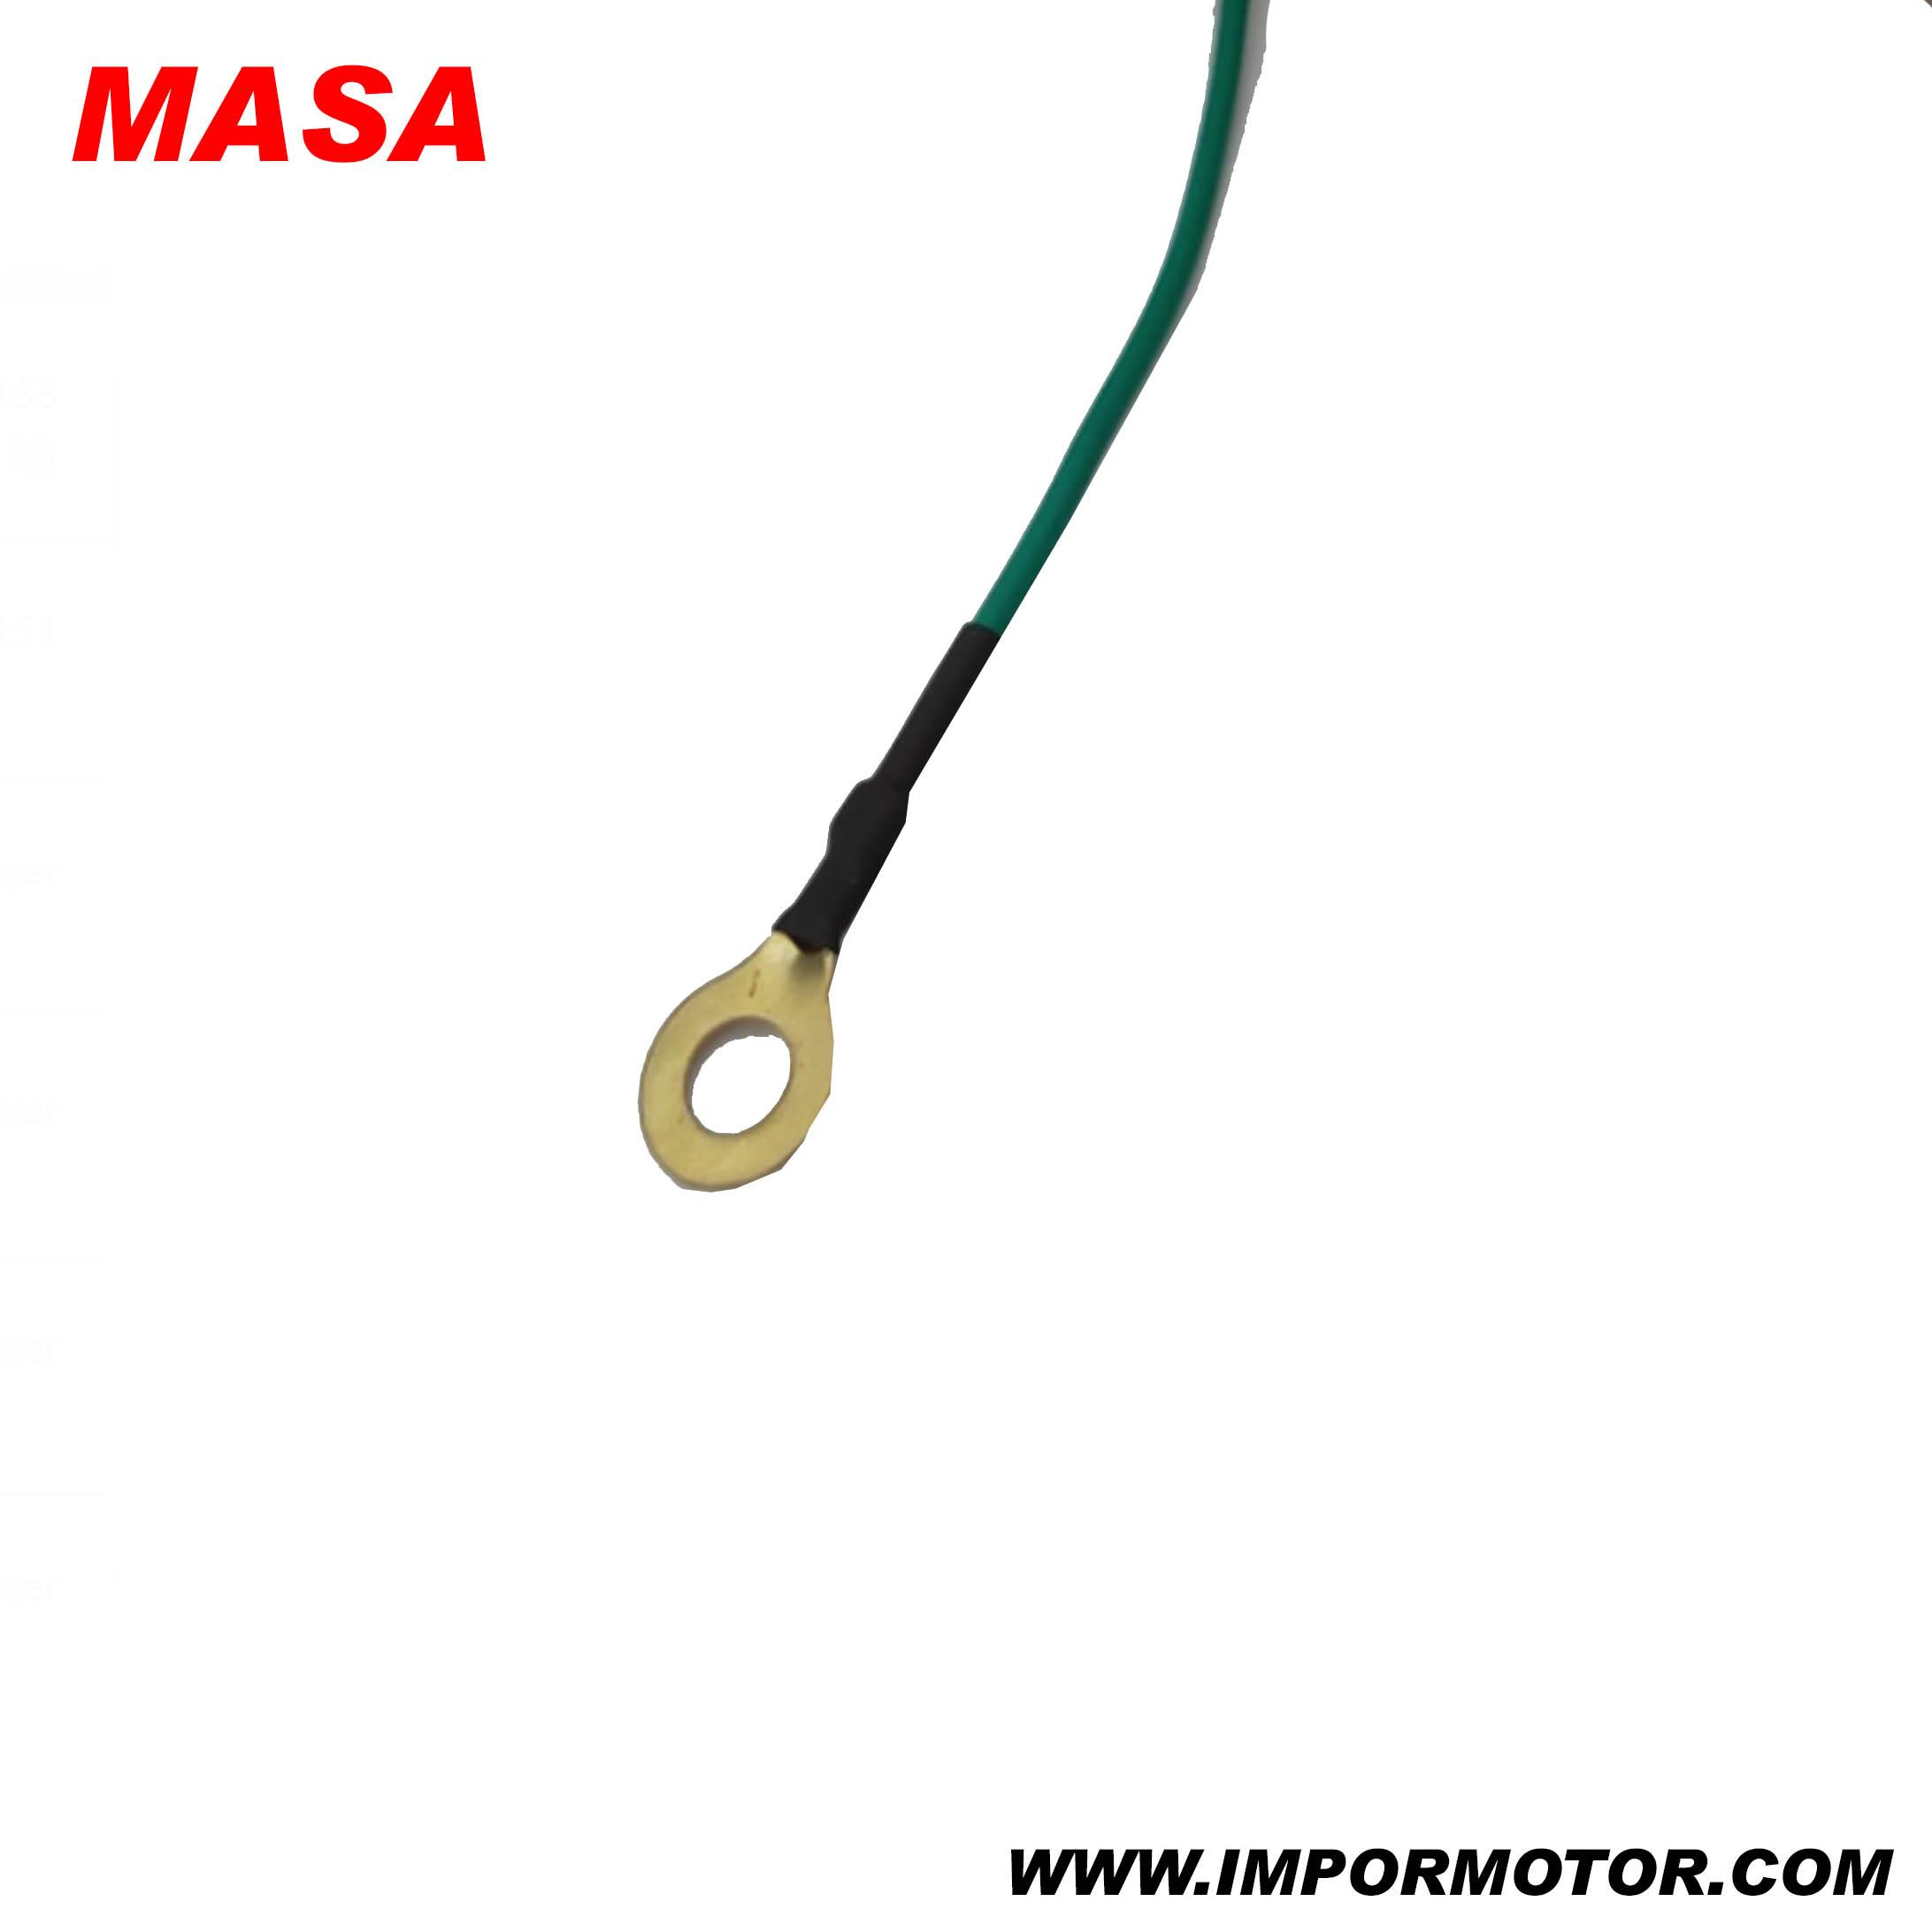 MASA-2.jpg